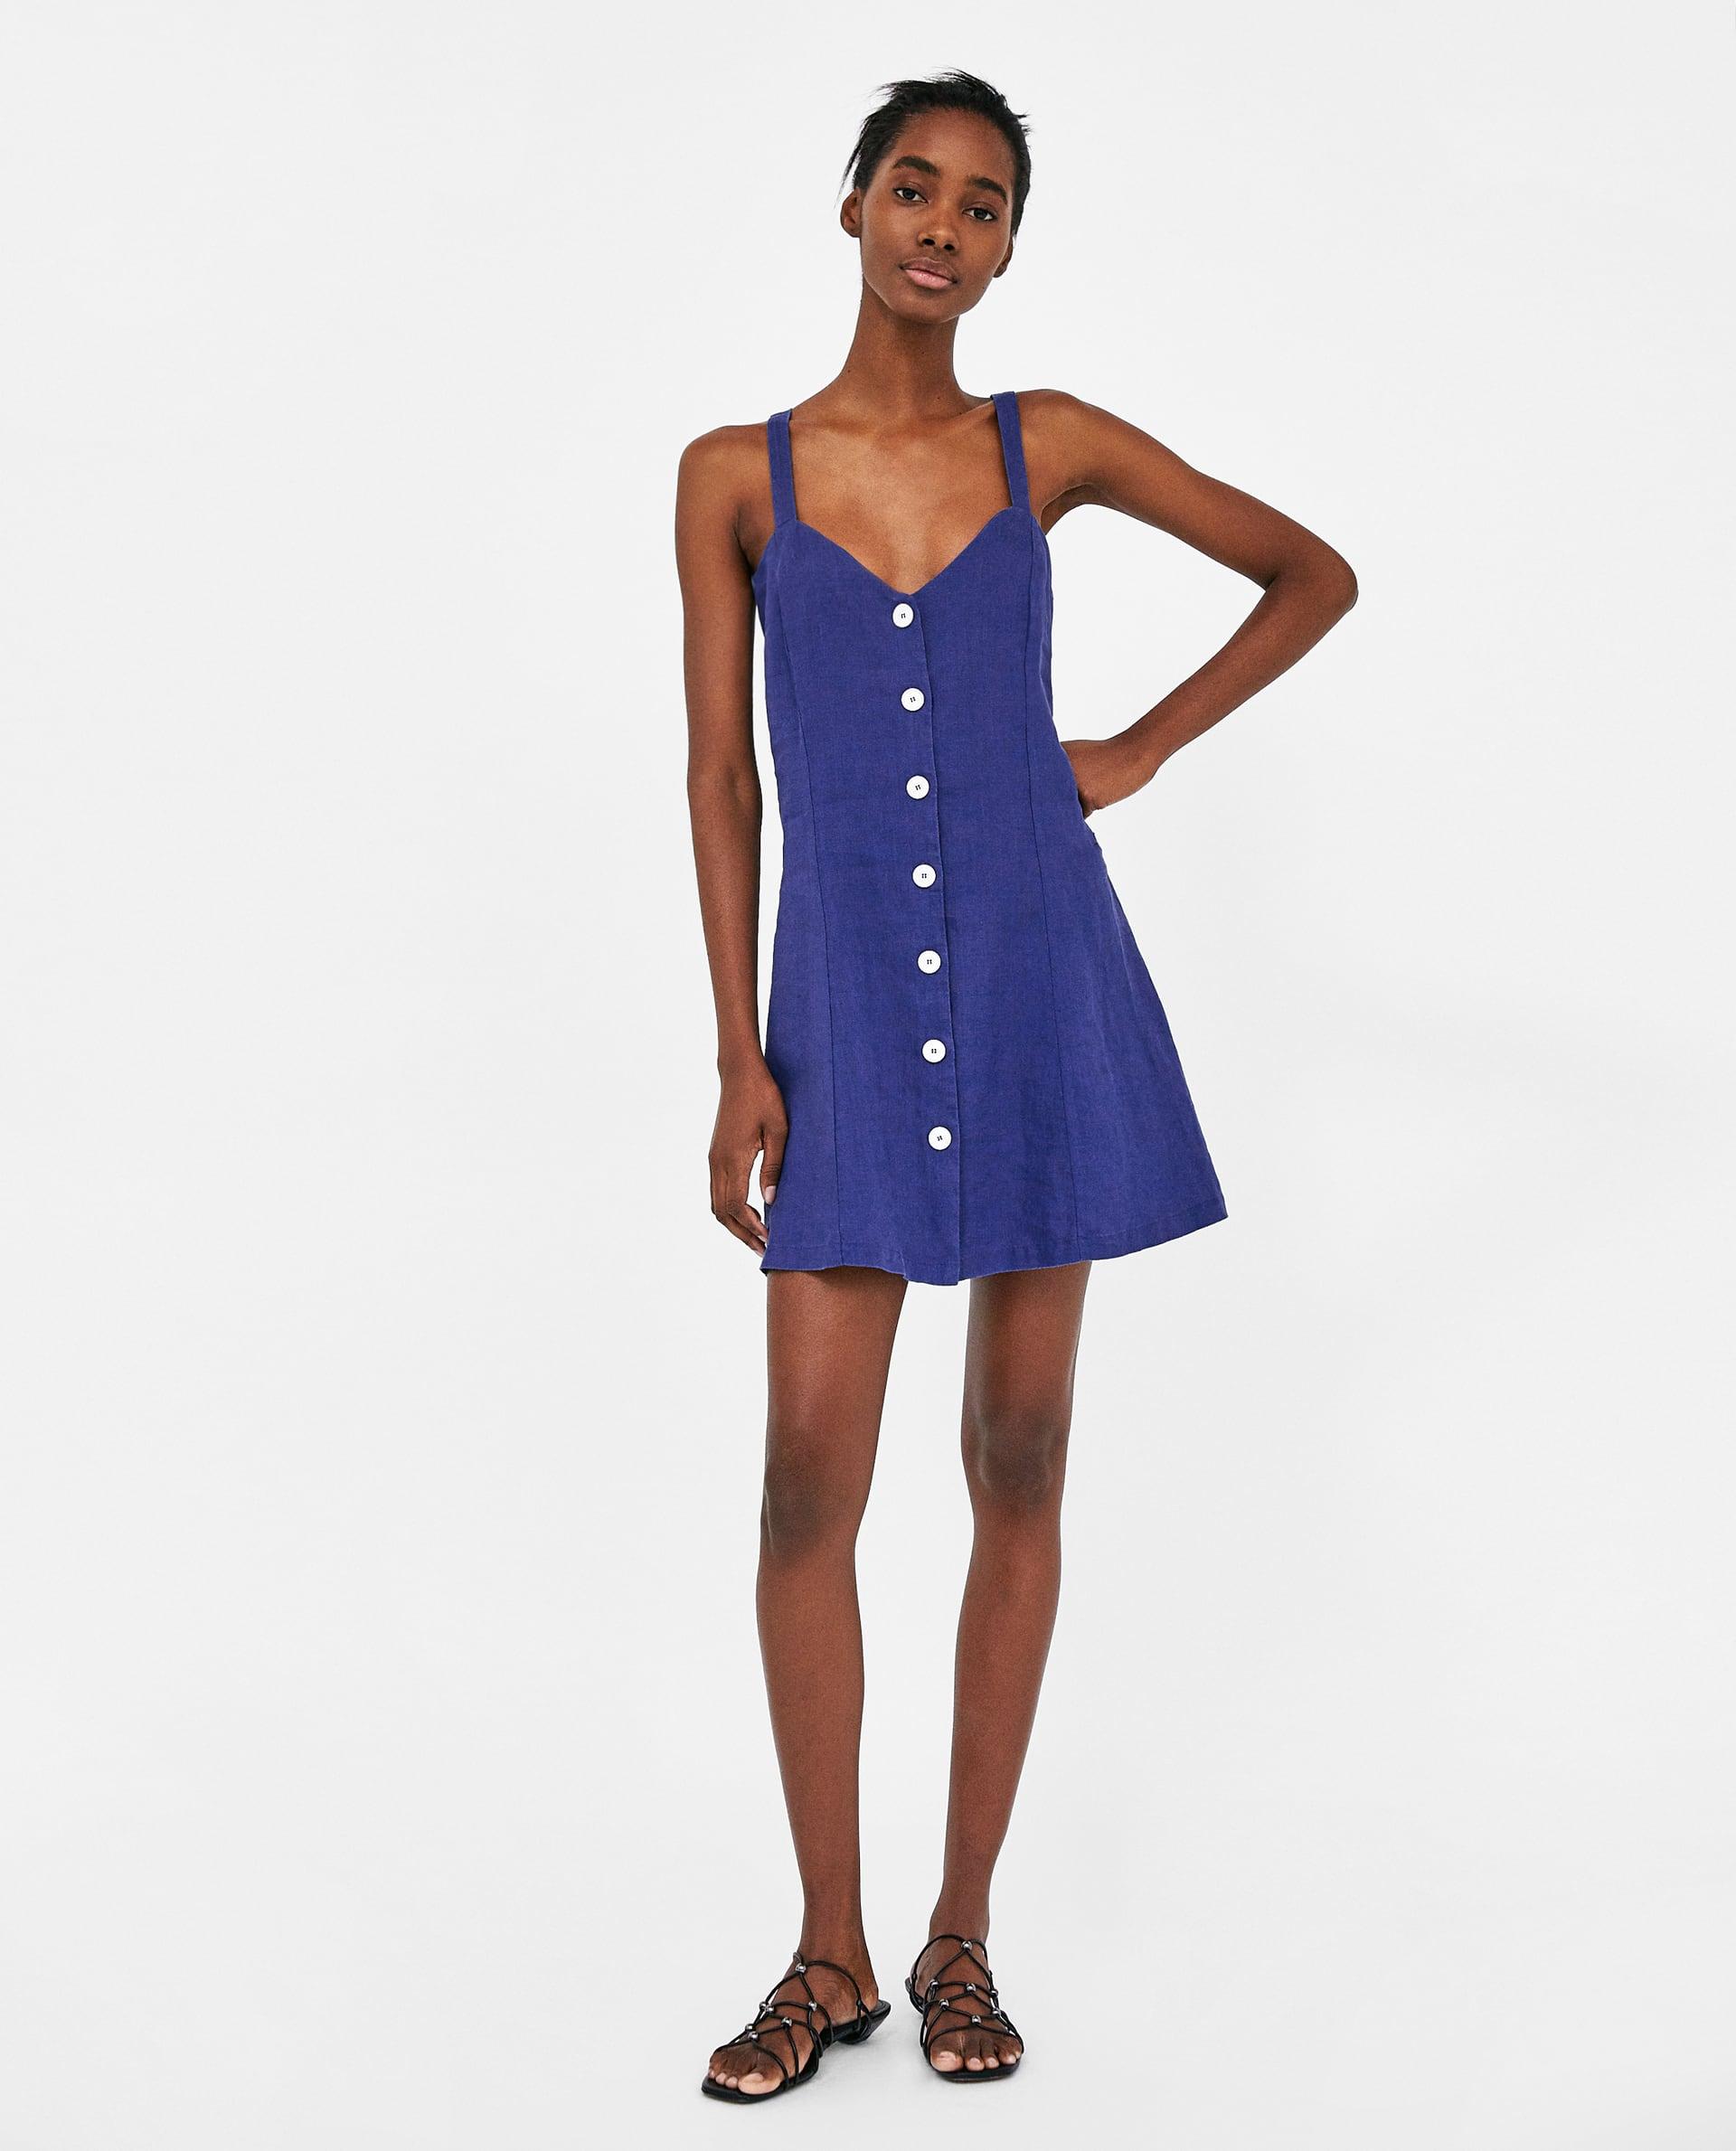 Zara-Strappy-Linen-Dress.jpg